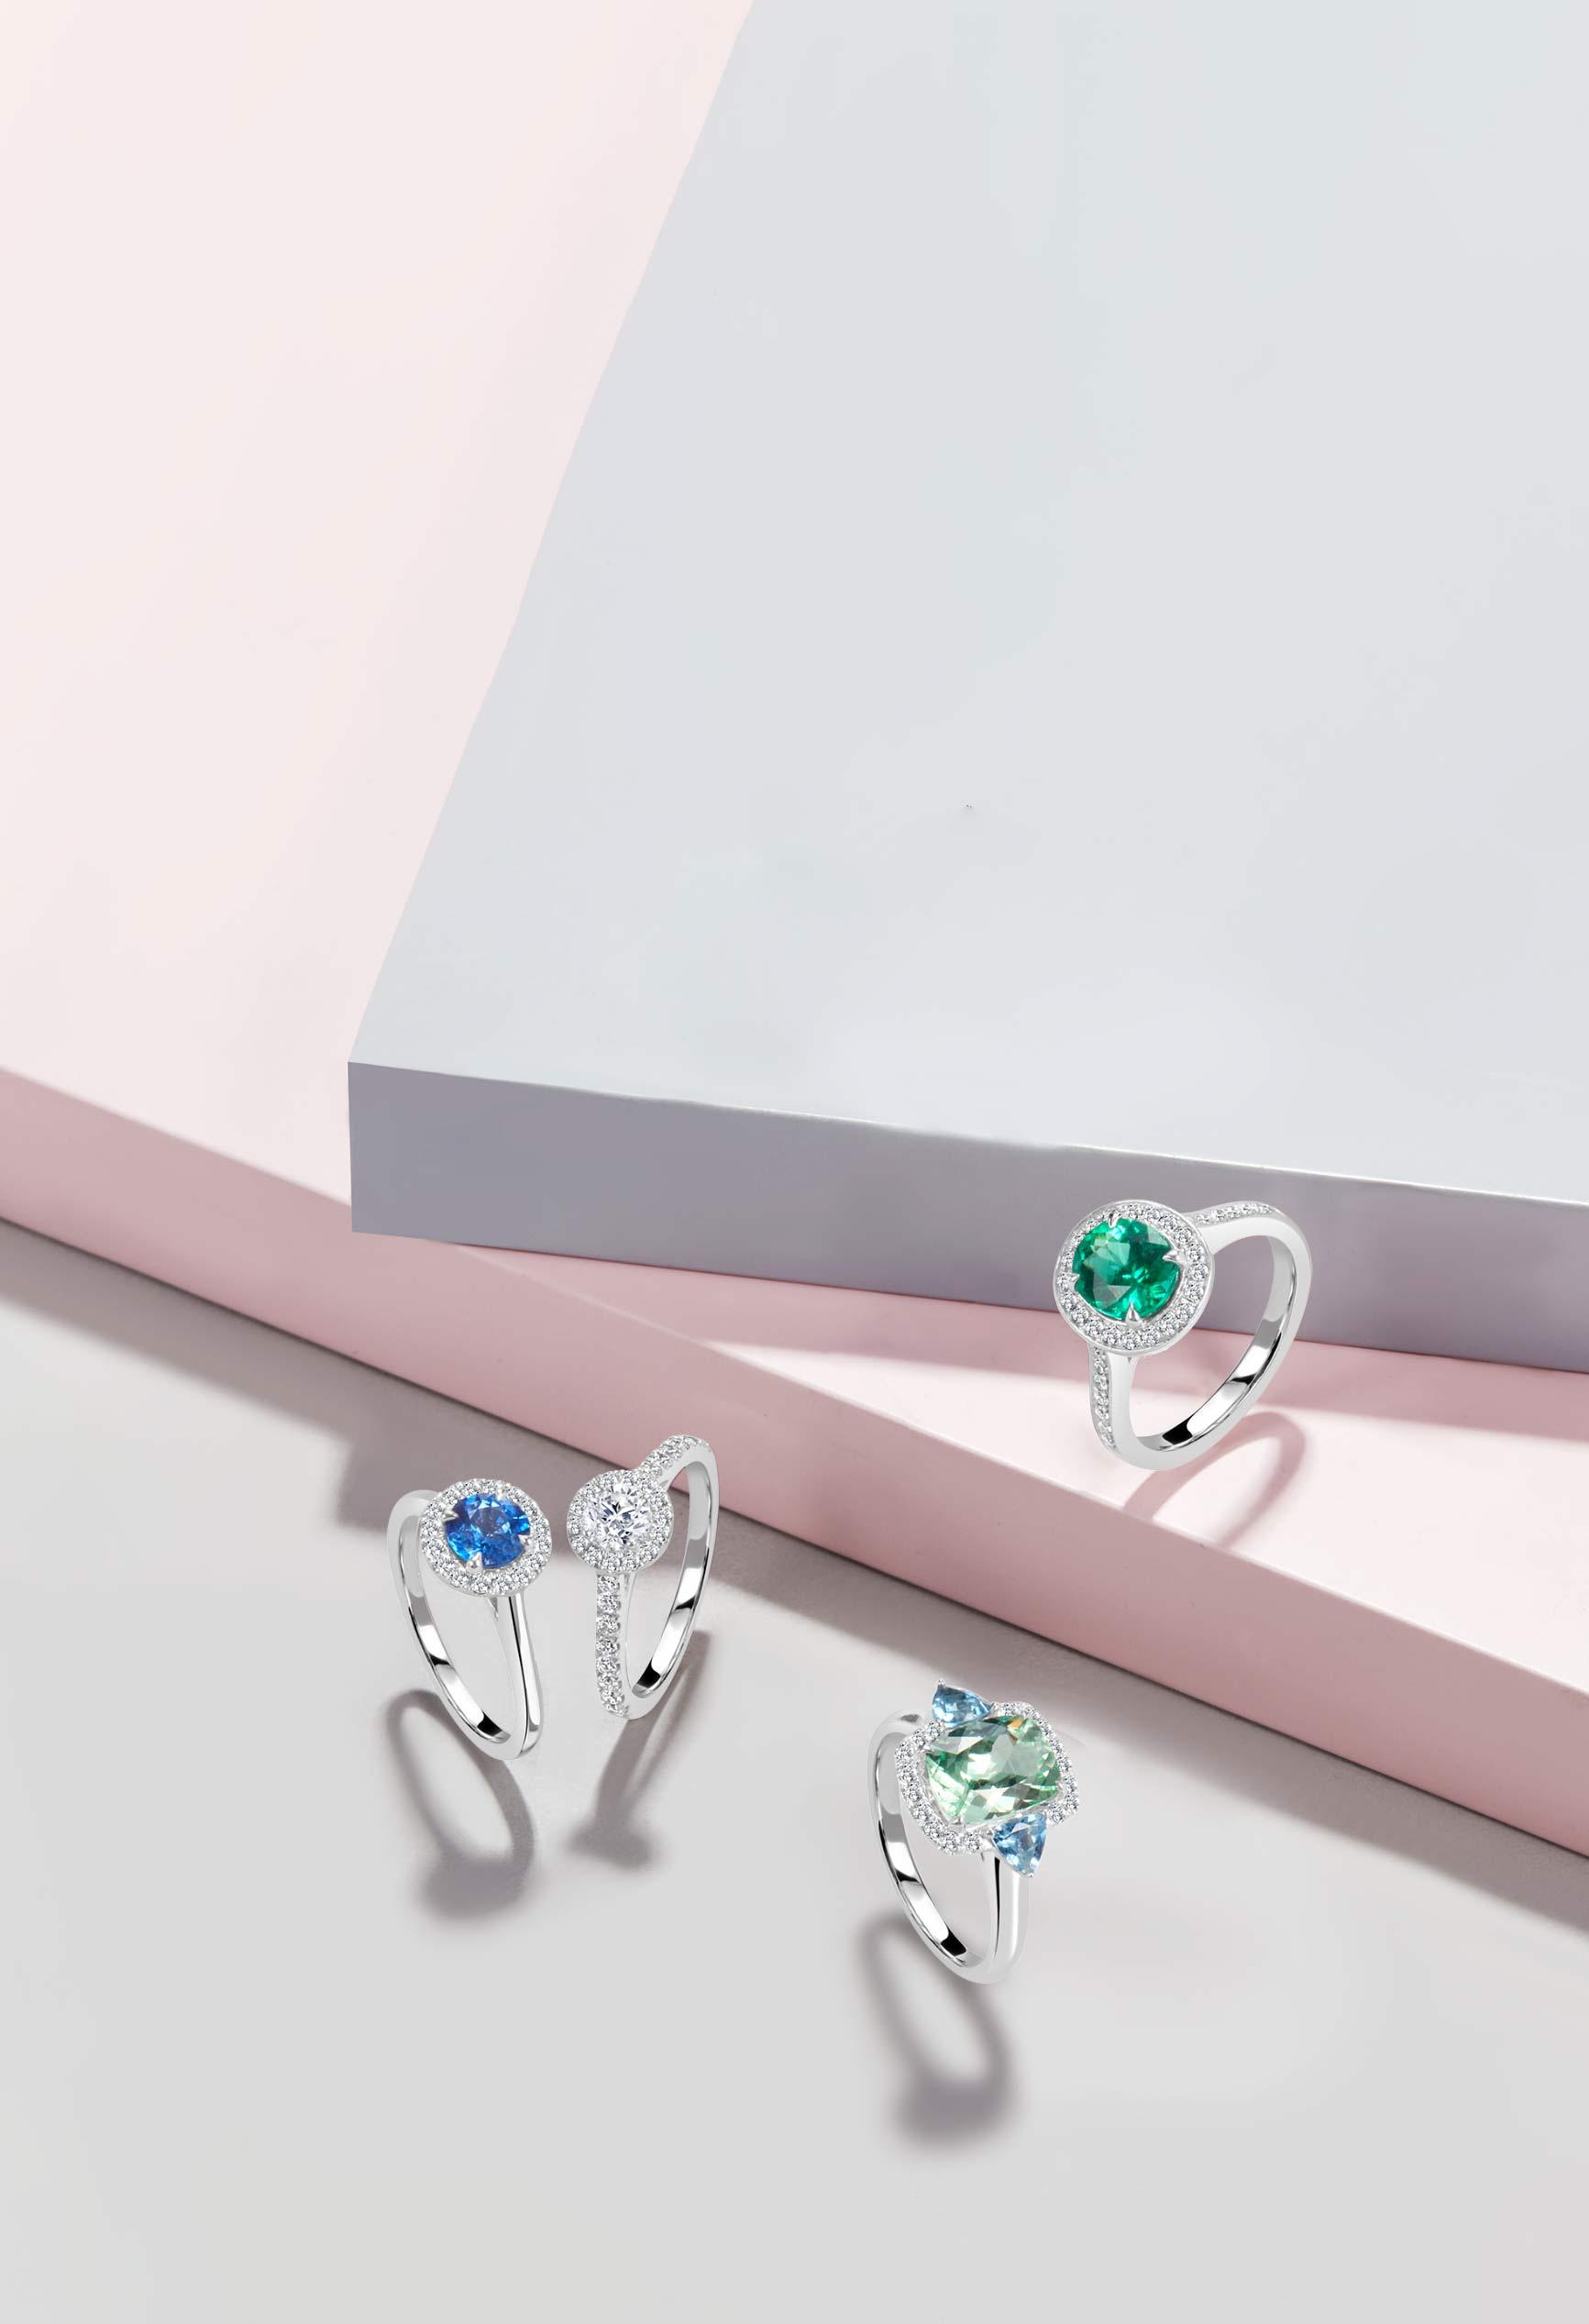 Gemstone Jewellery - Steven Stone